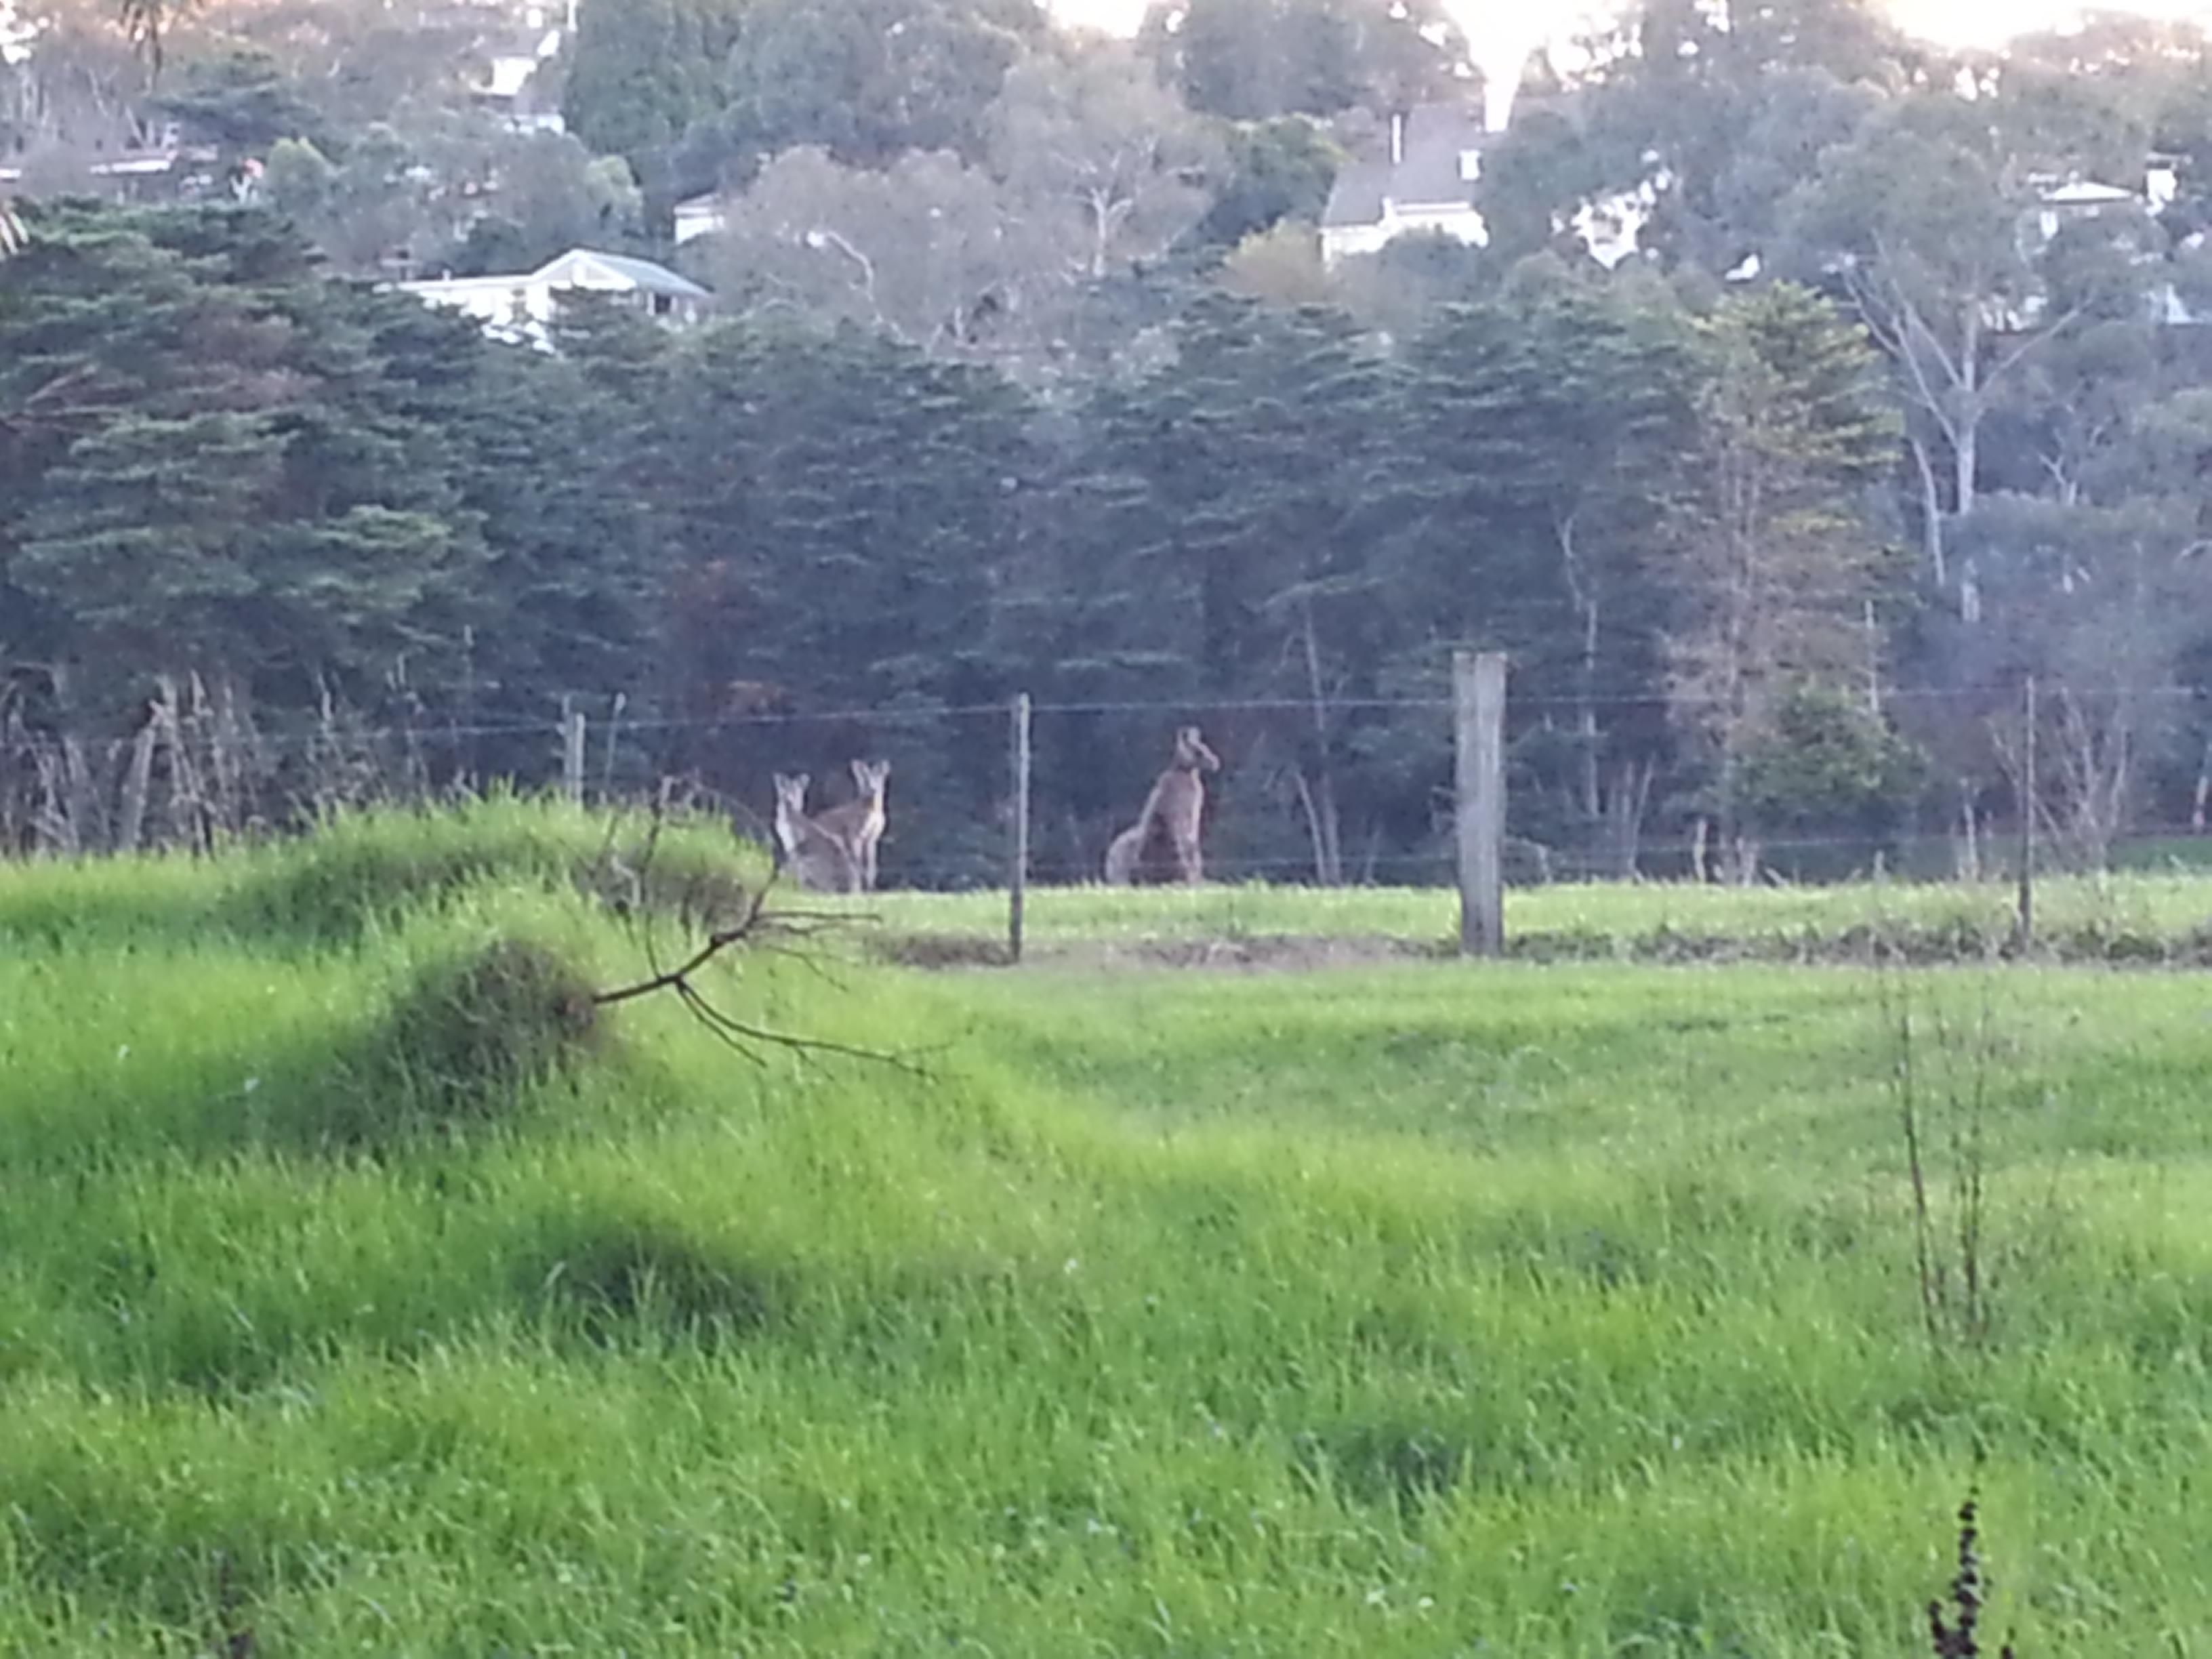 Kangaroo Maths Past Papers For Grade 1